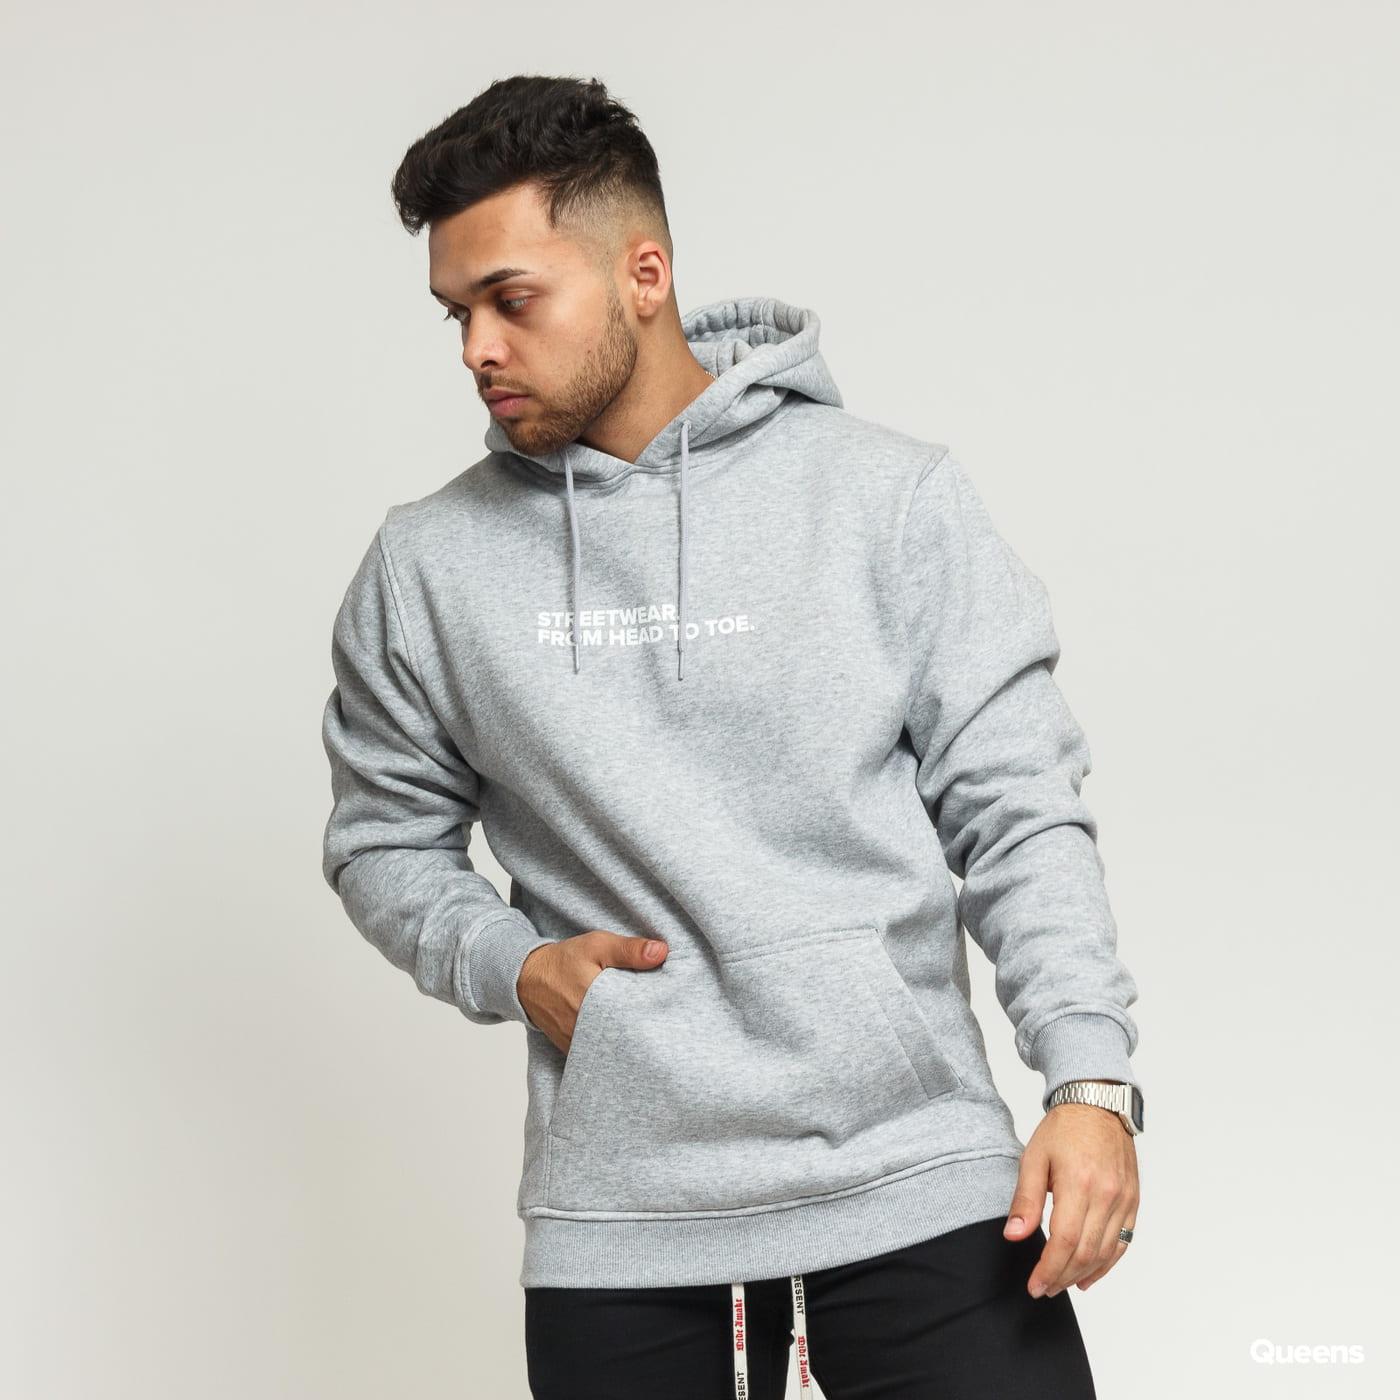 competitive price 45e3d 6926b Queens Streetwear Hoodie melange gray